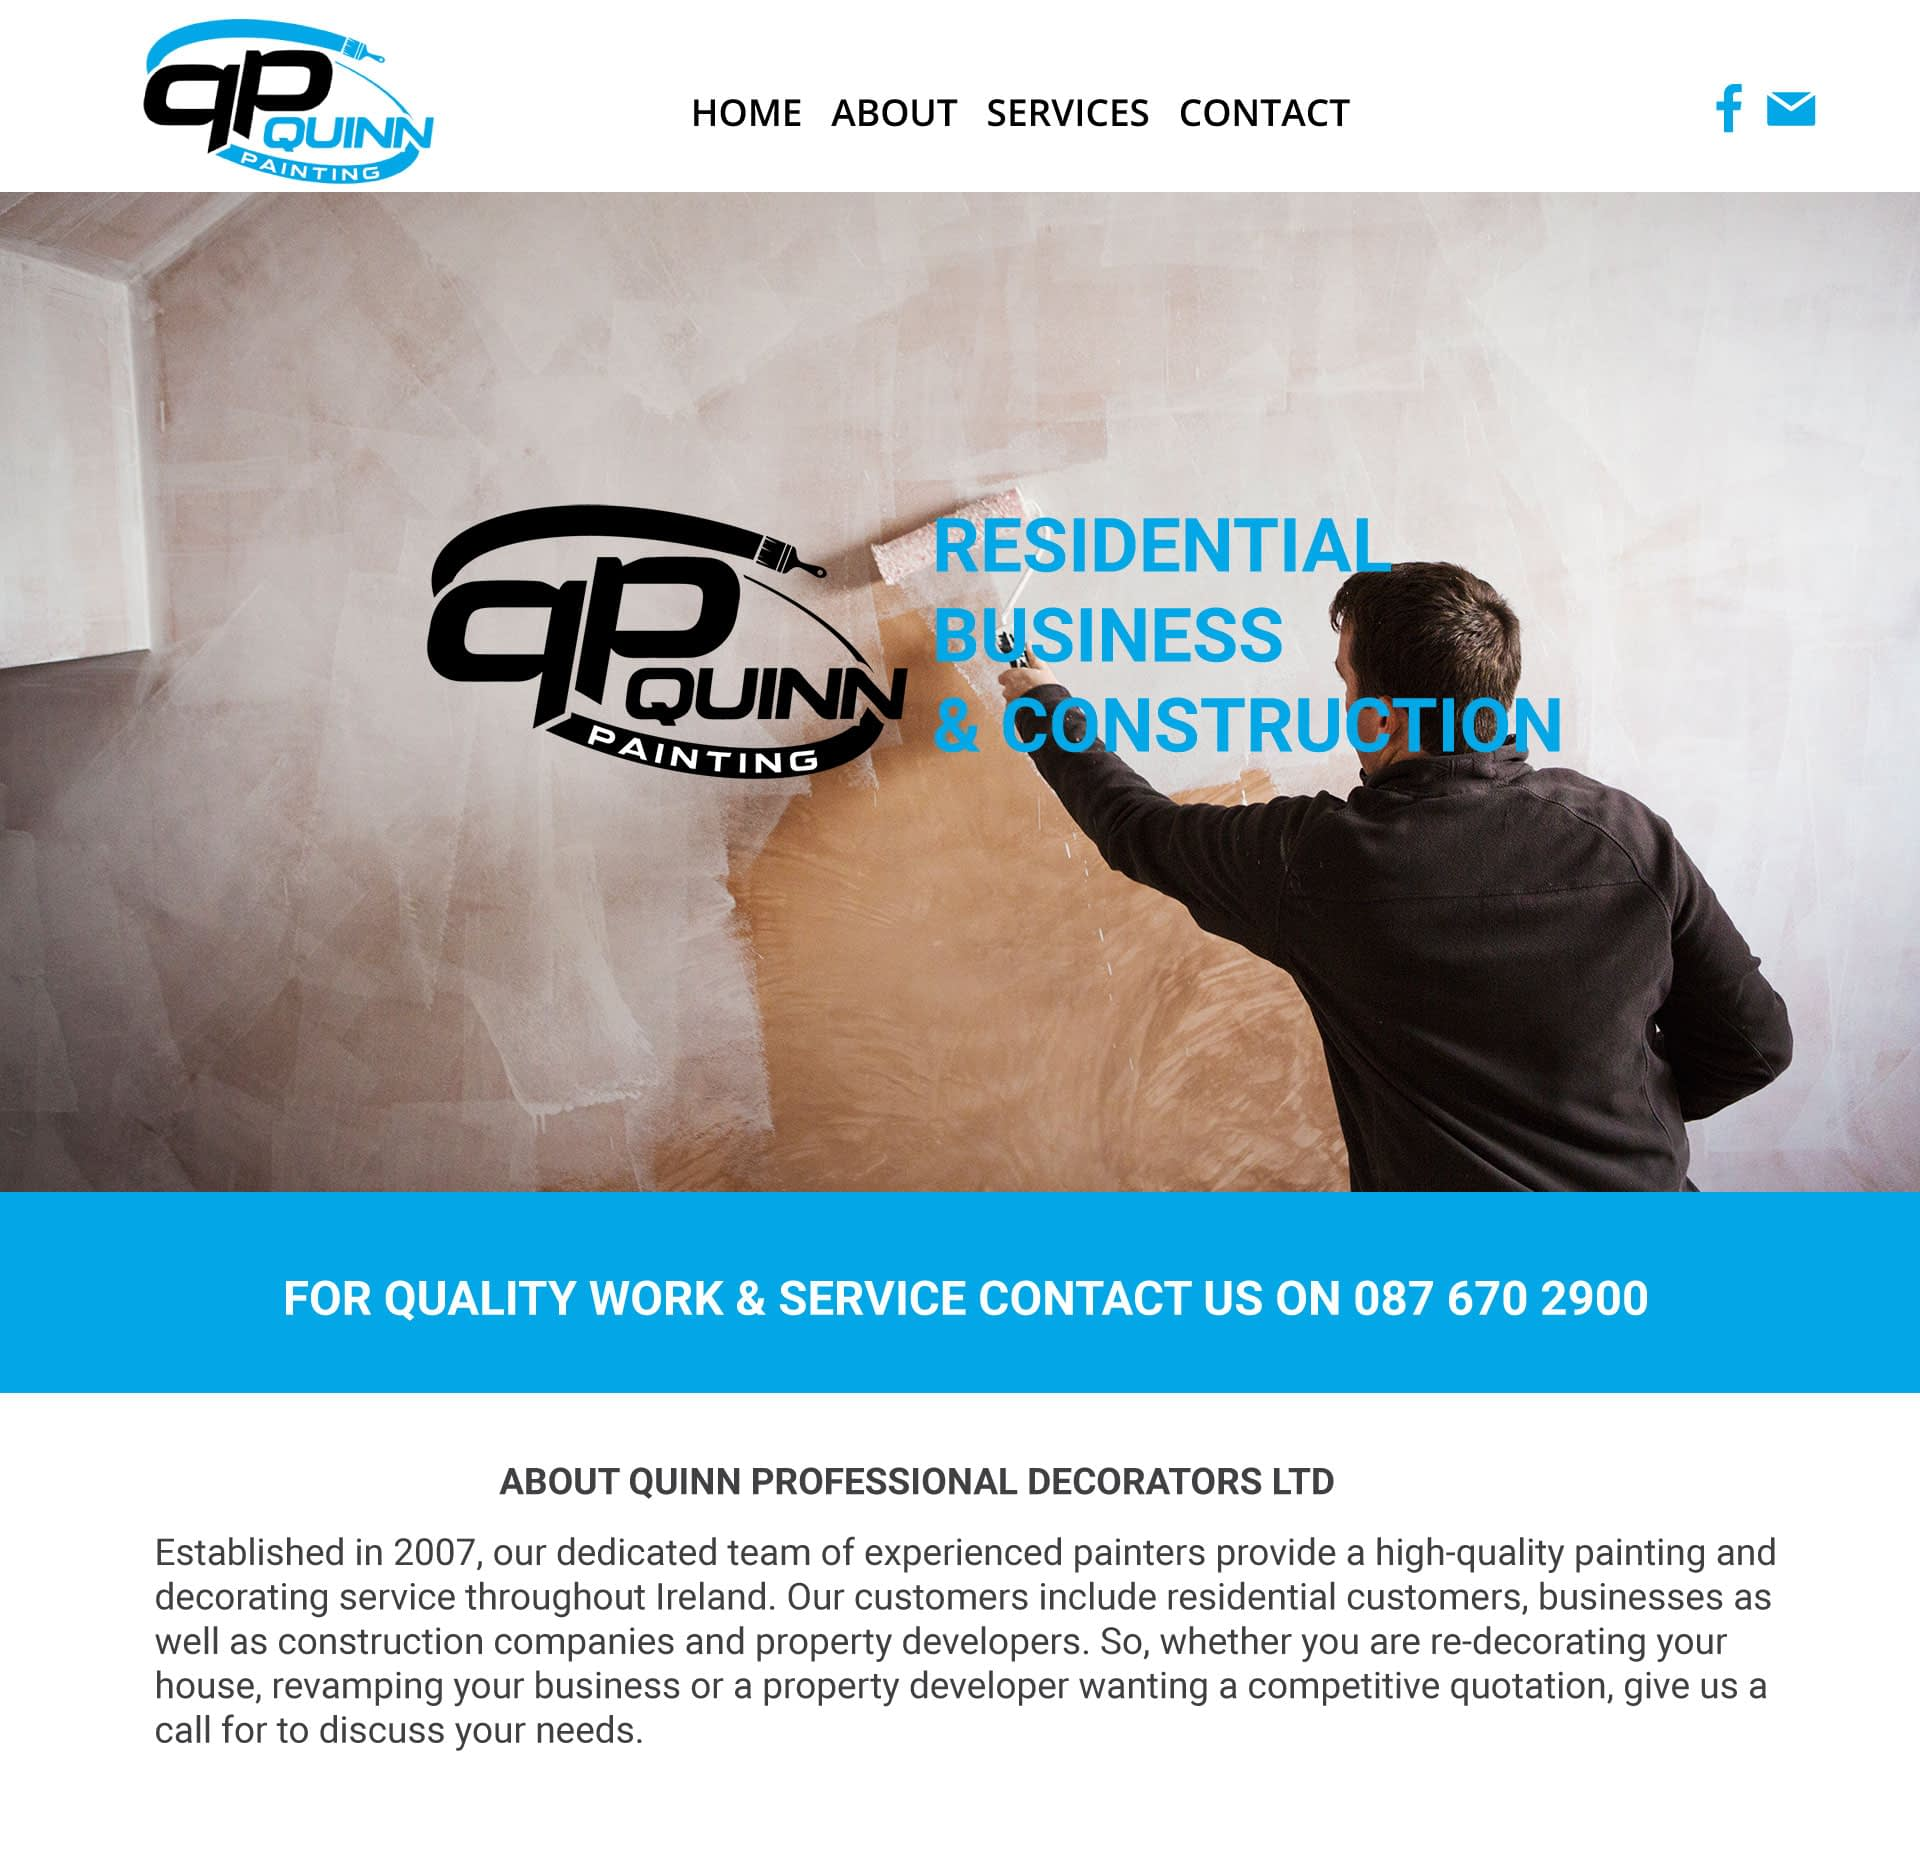 portfolio-quinn-painters-geekdimm-1